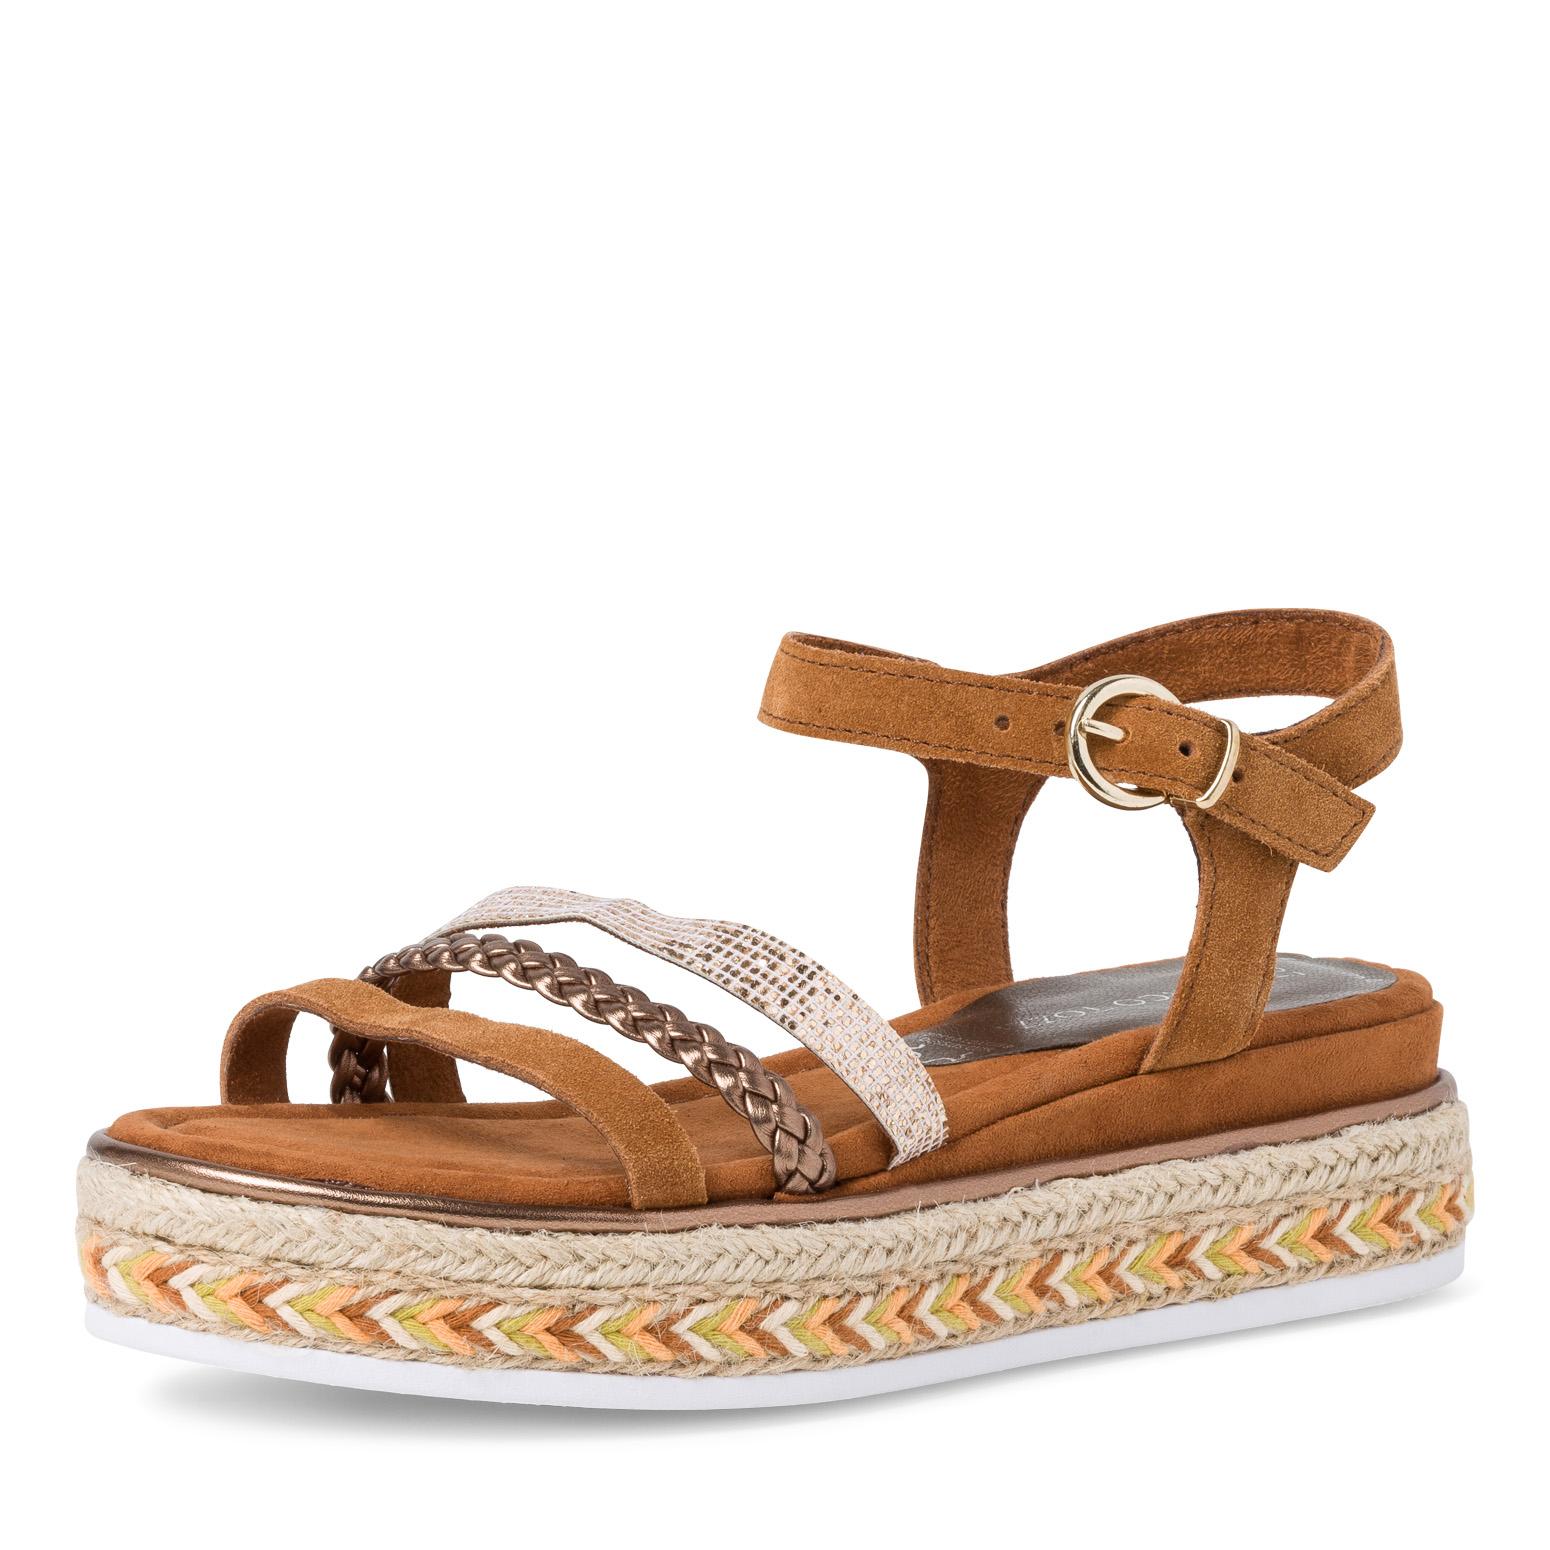 Sandale plateforme Marco Tozzi 28735 392